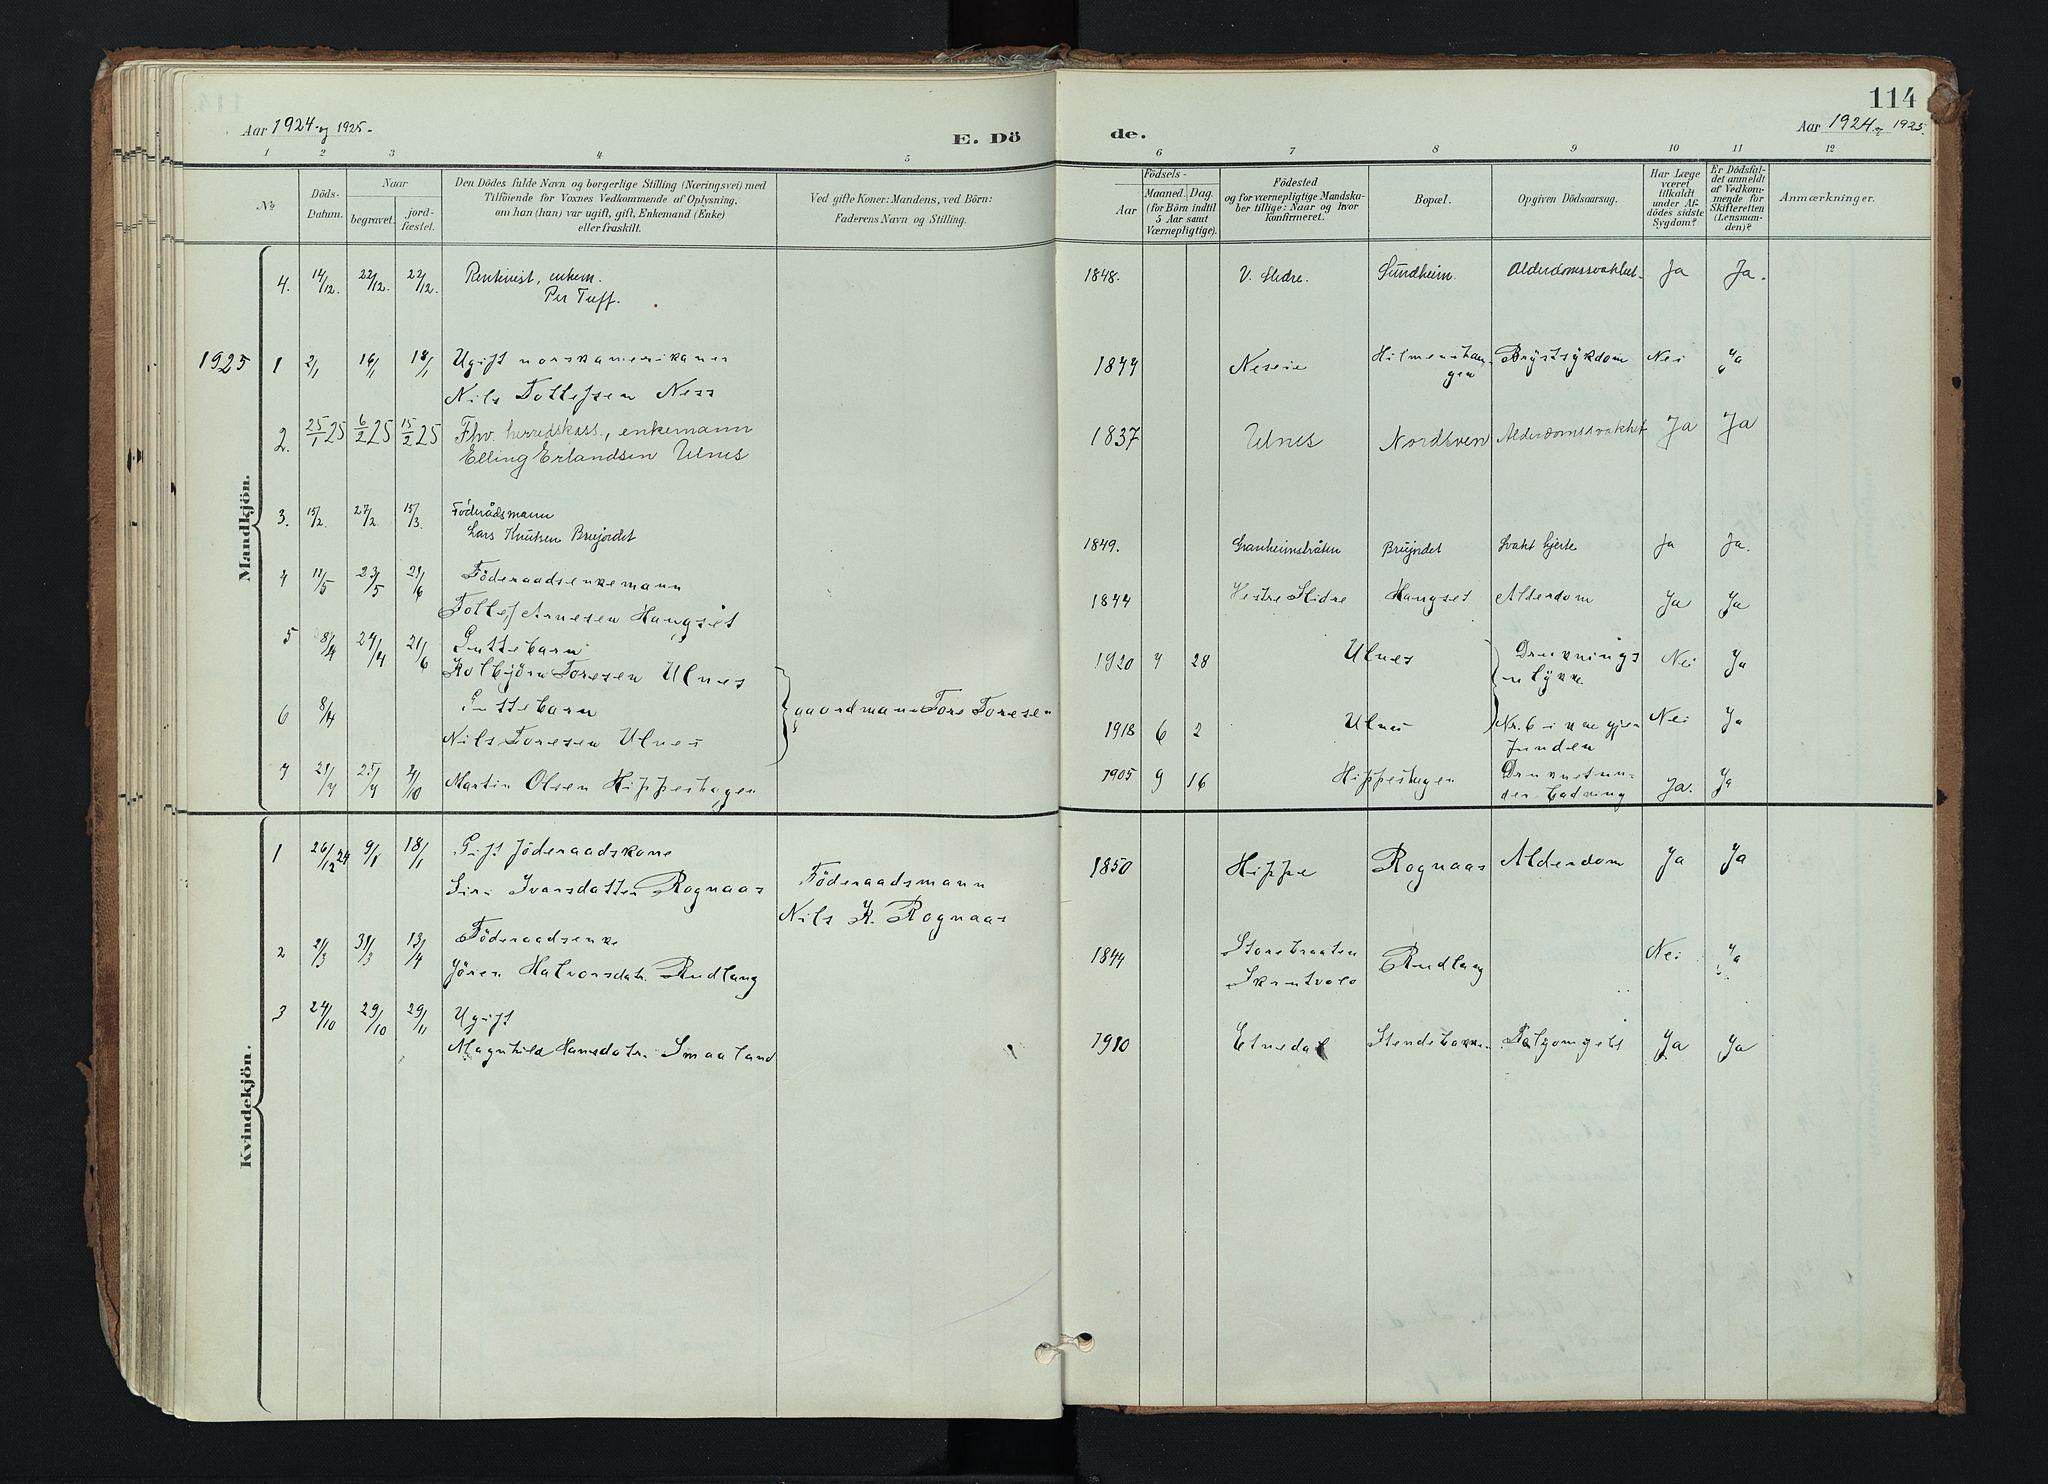 SAH, Nord-Aurdal prestekontor, Ministerialbok nr. 17, 1897-1926, s. 114